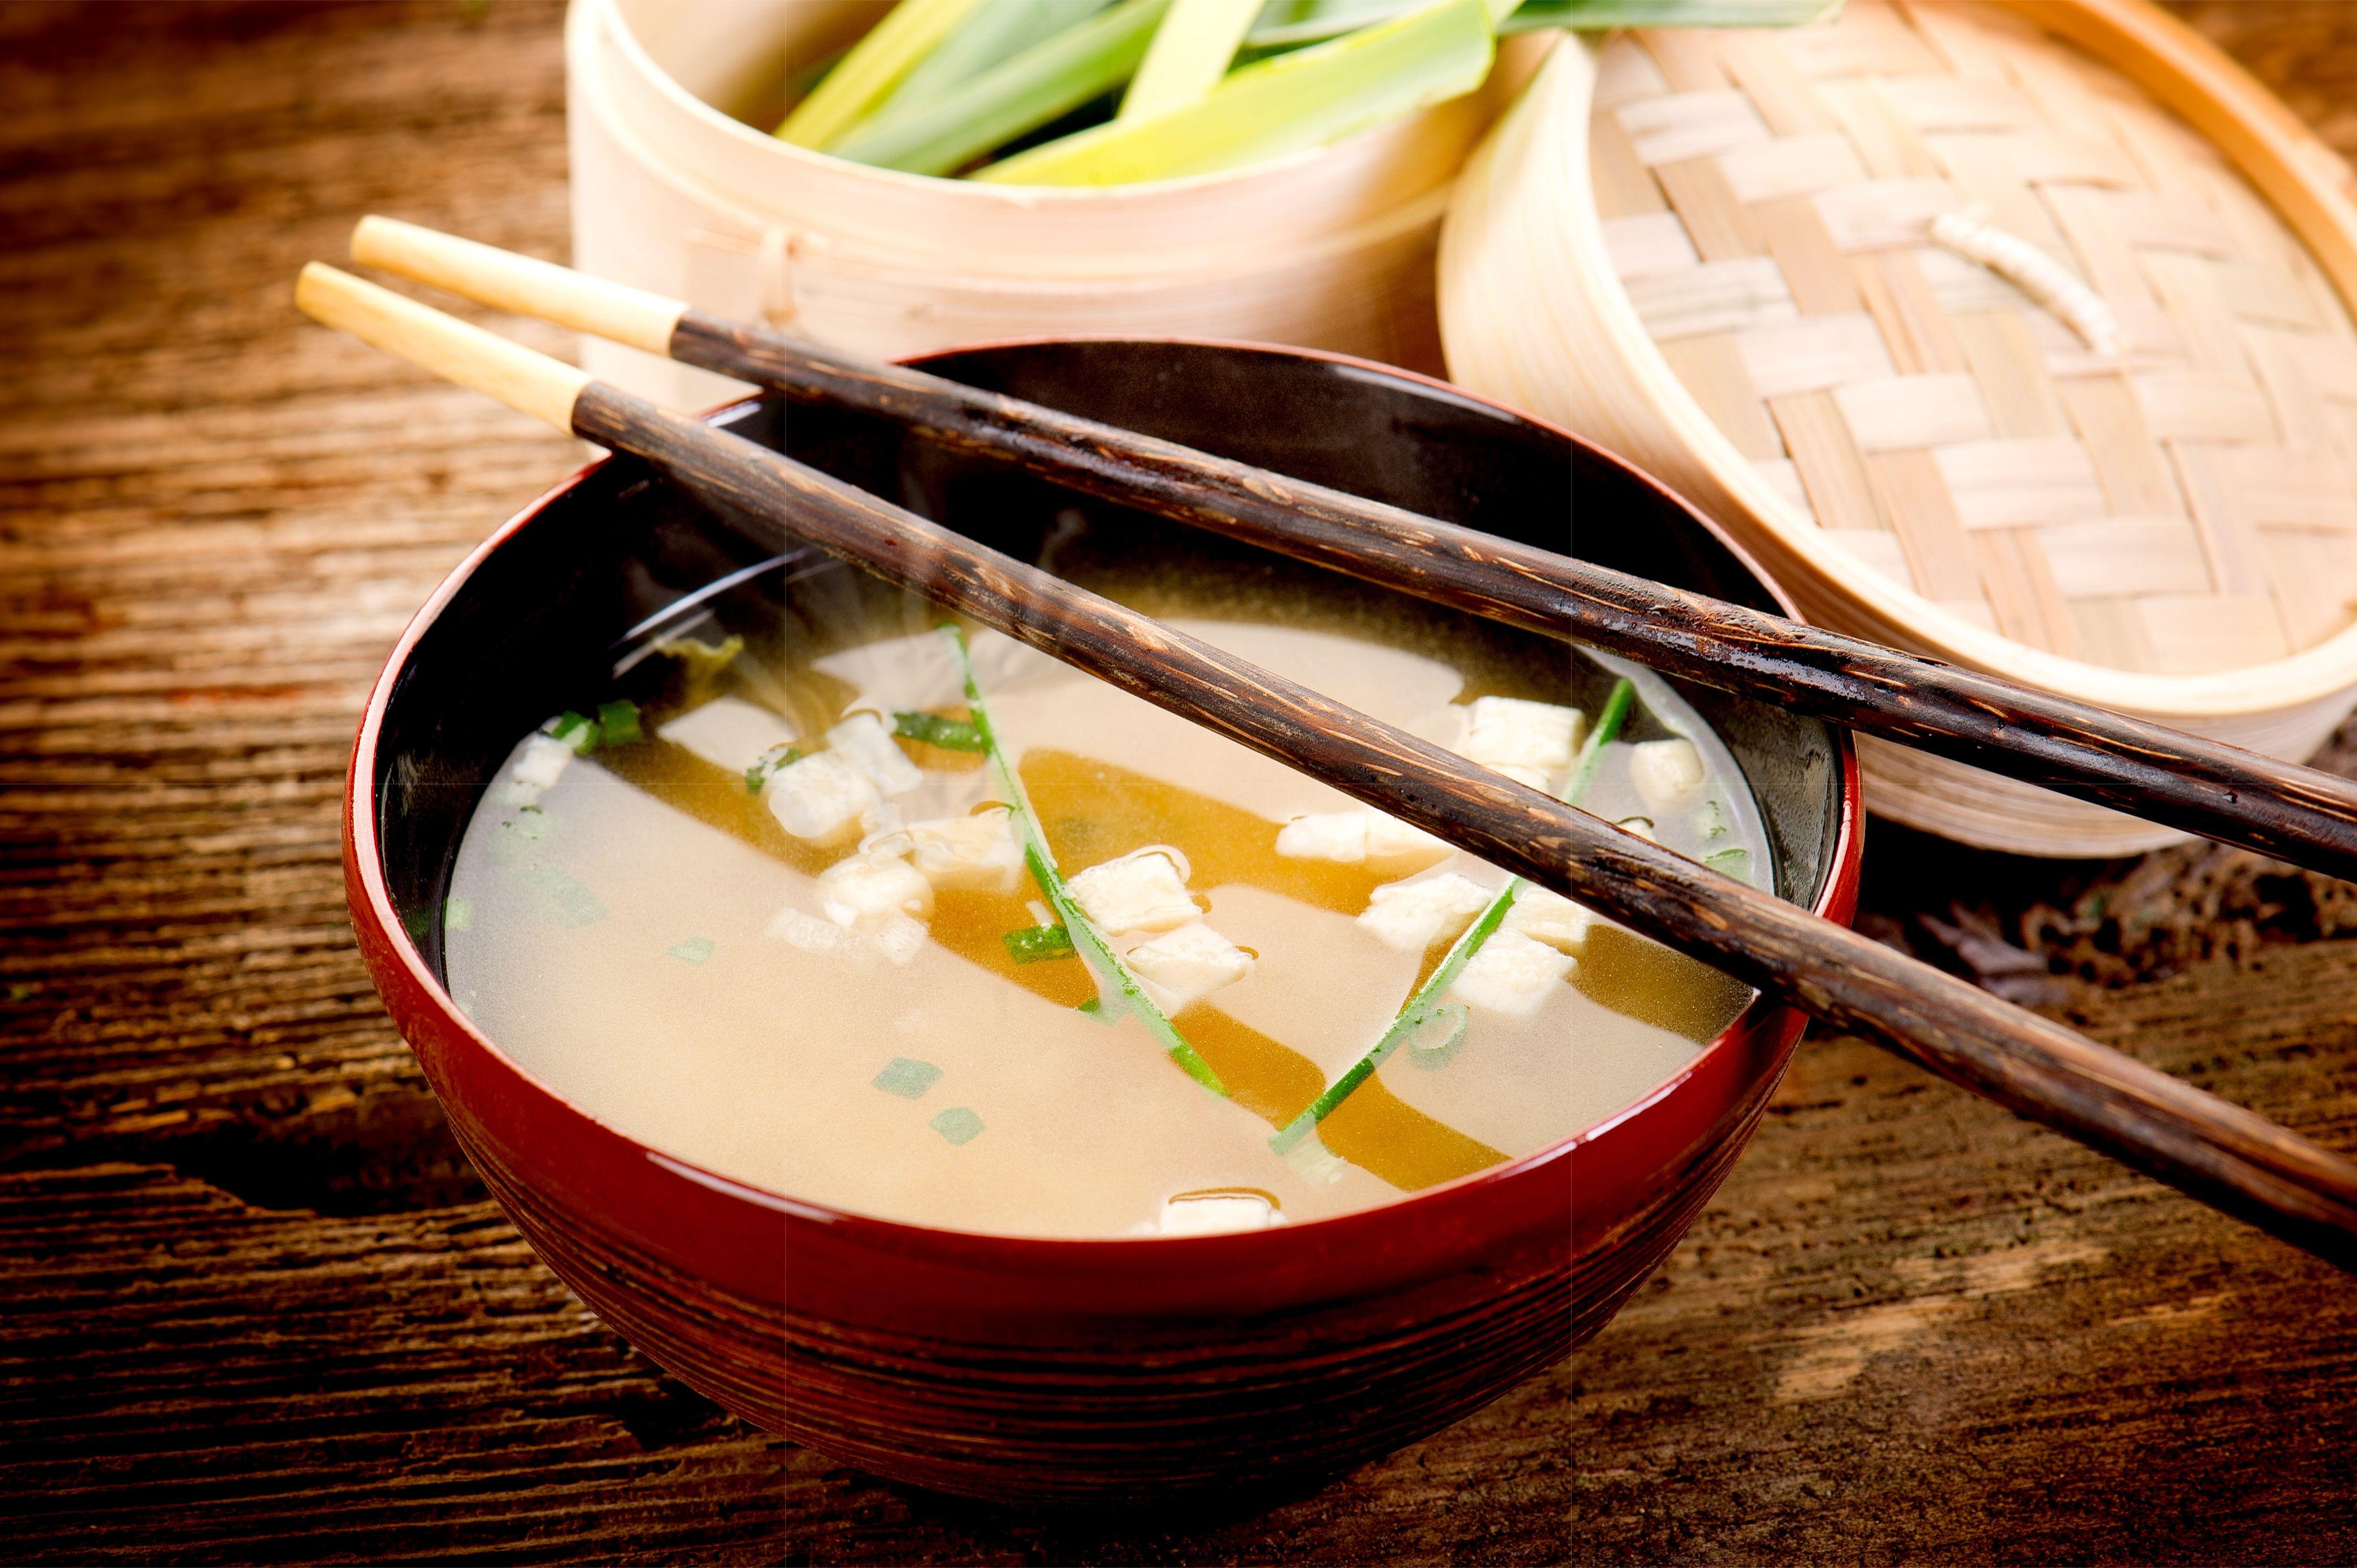 Sopa Umami, una receta japonesa espectacular